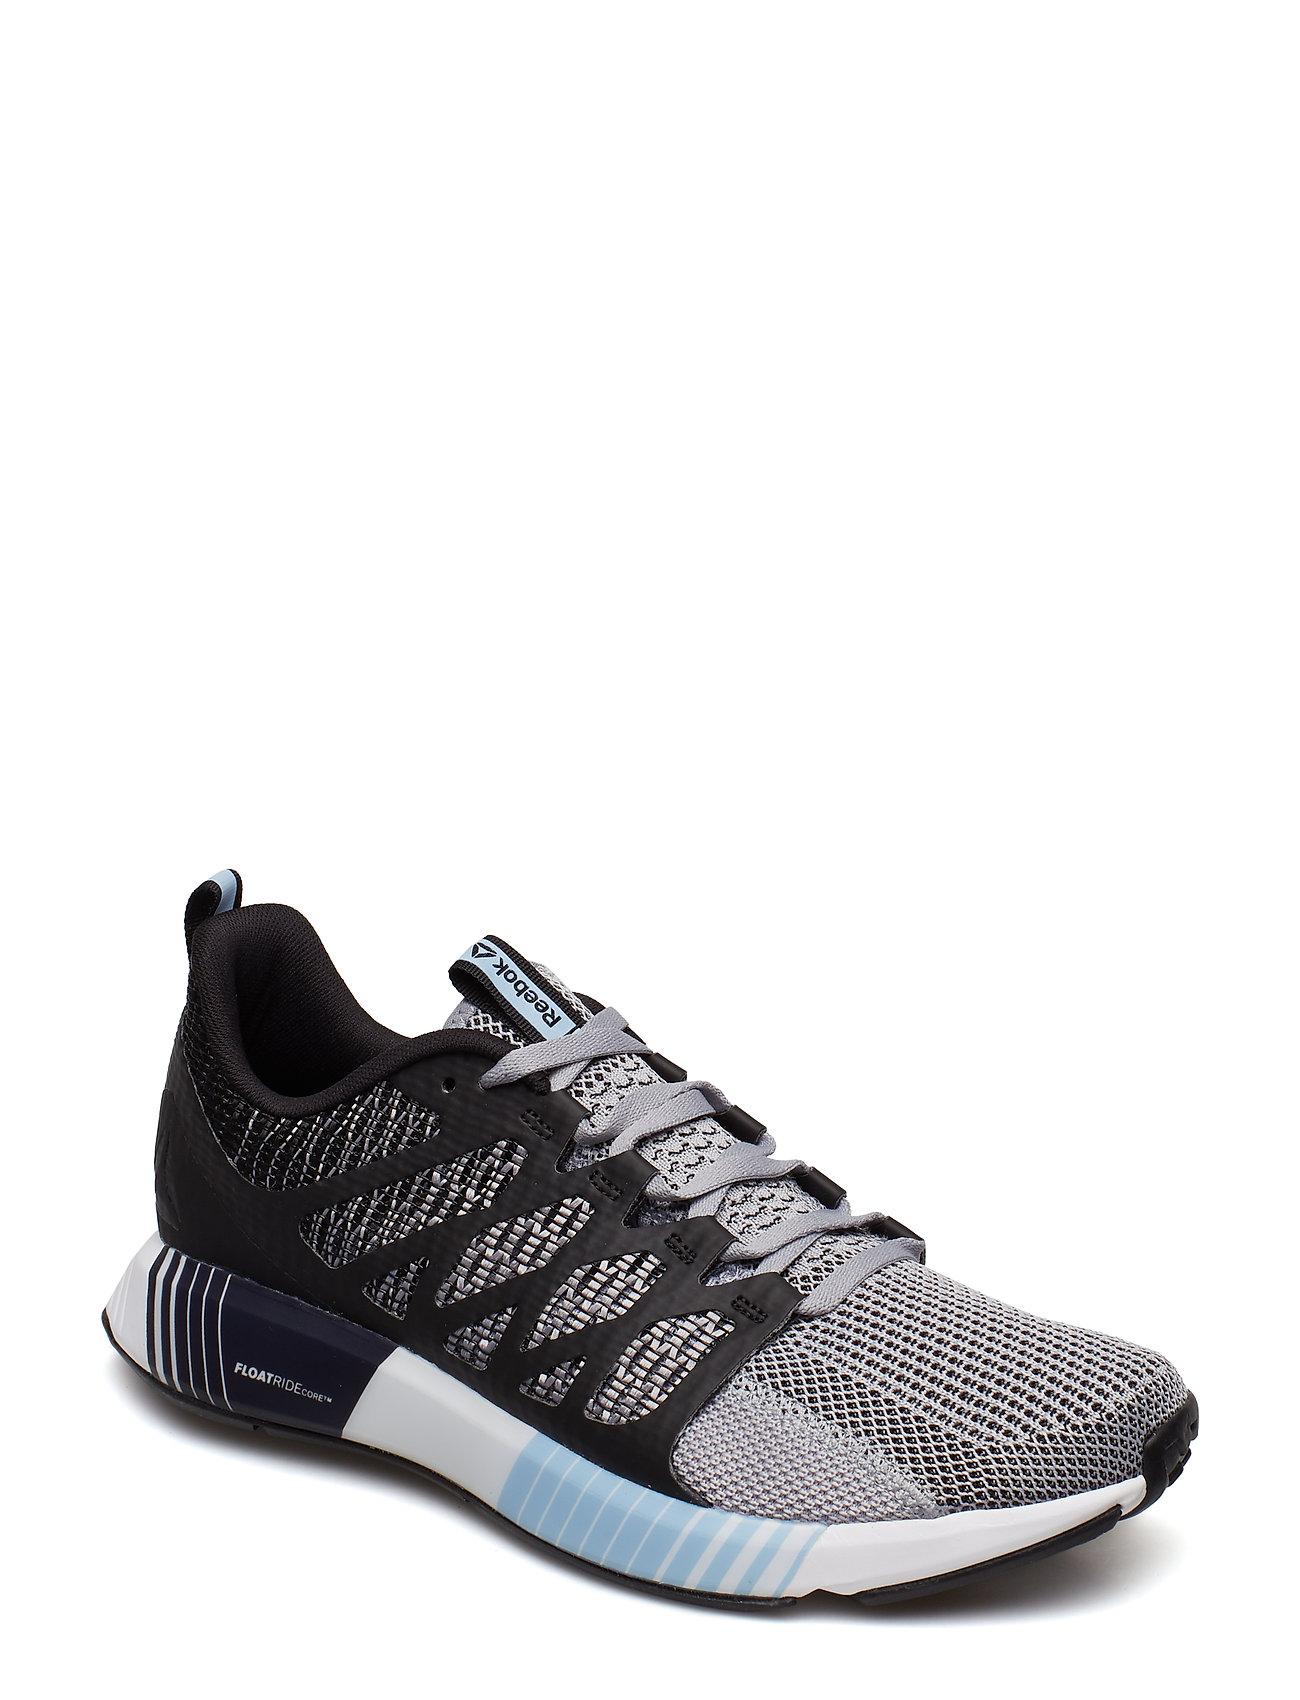 REEBOK Fusion Flexweave Cage Shoes Sport Shoes Running Shoes Schwarz REEBOK PERFORMANCE